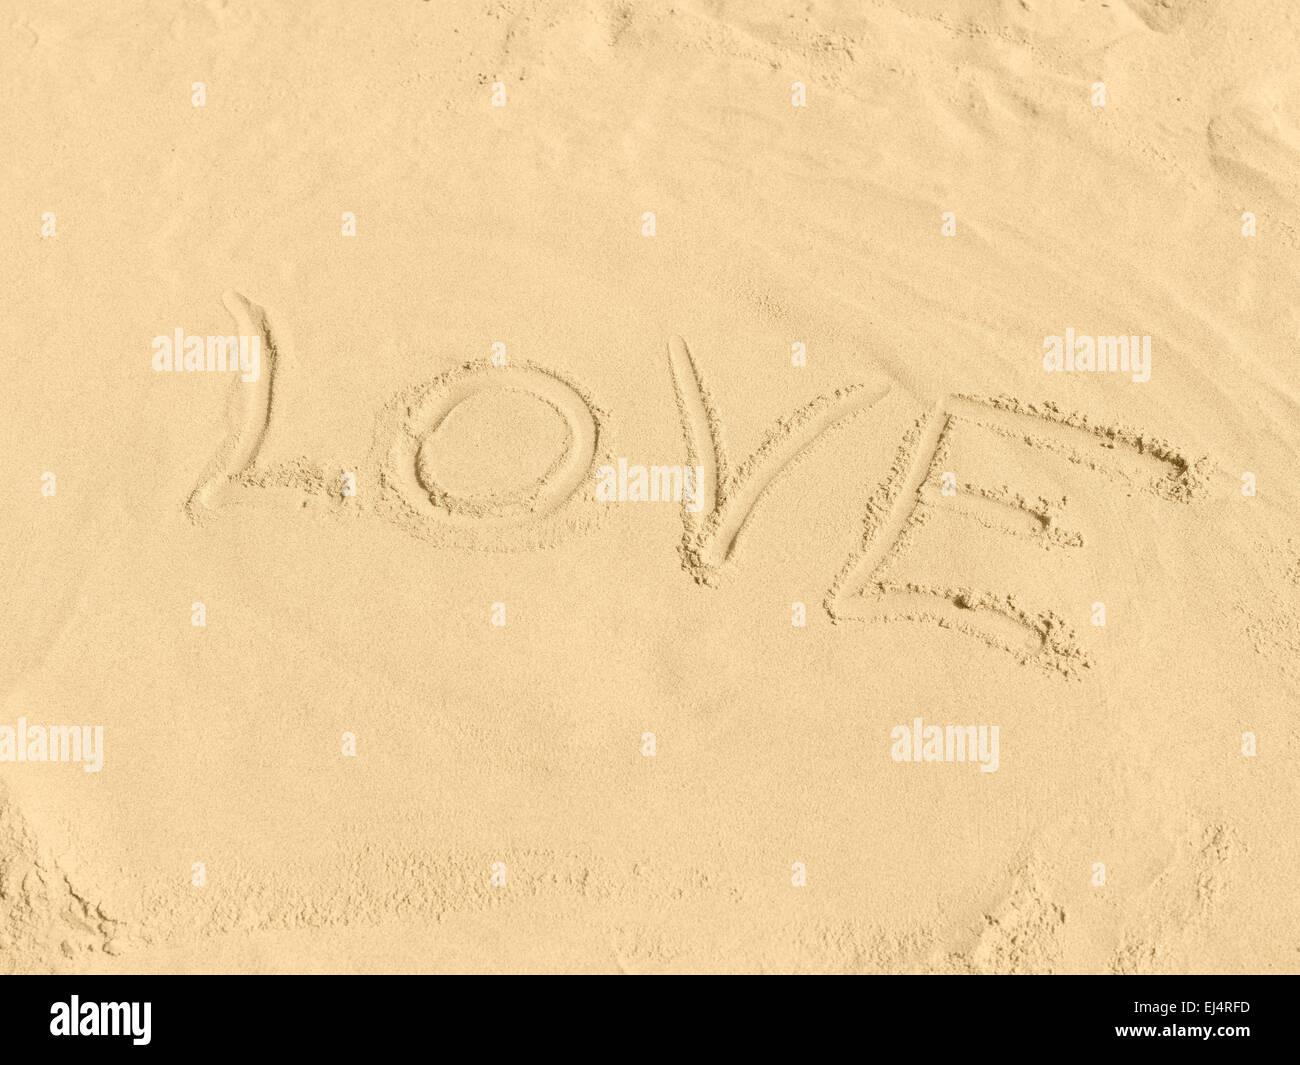 LOVE am Strand in Sand gemalt - Stock Image